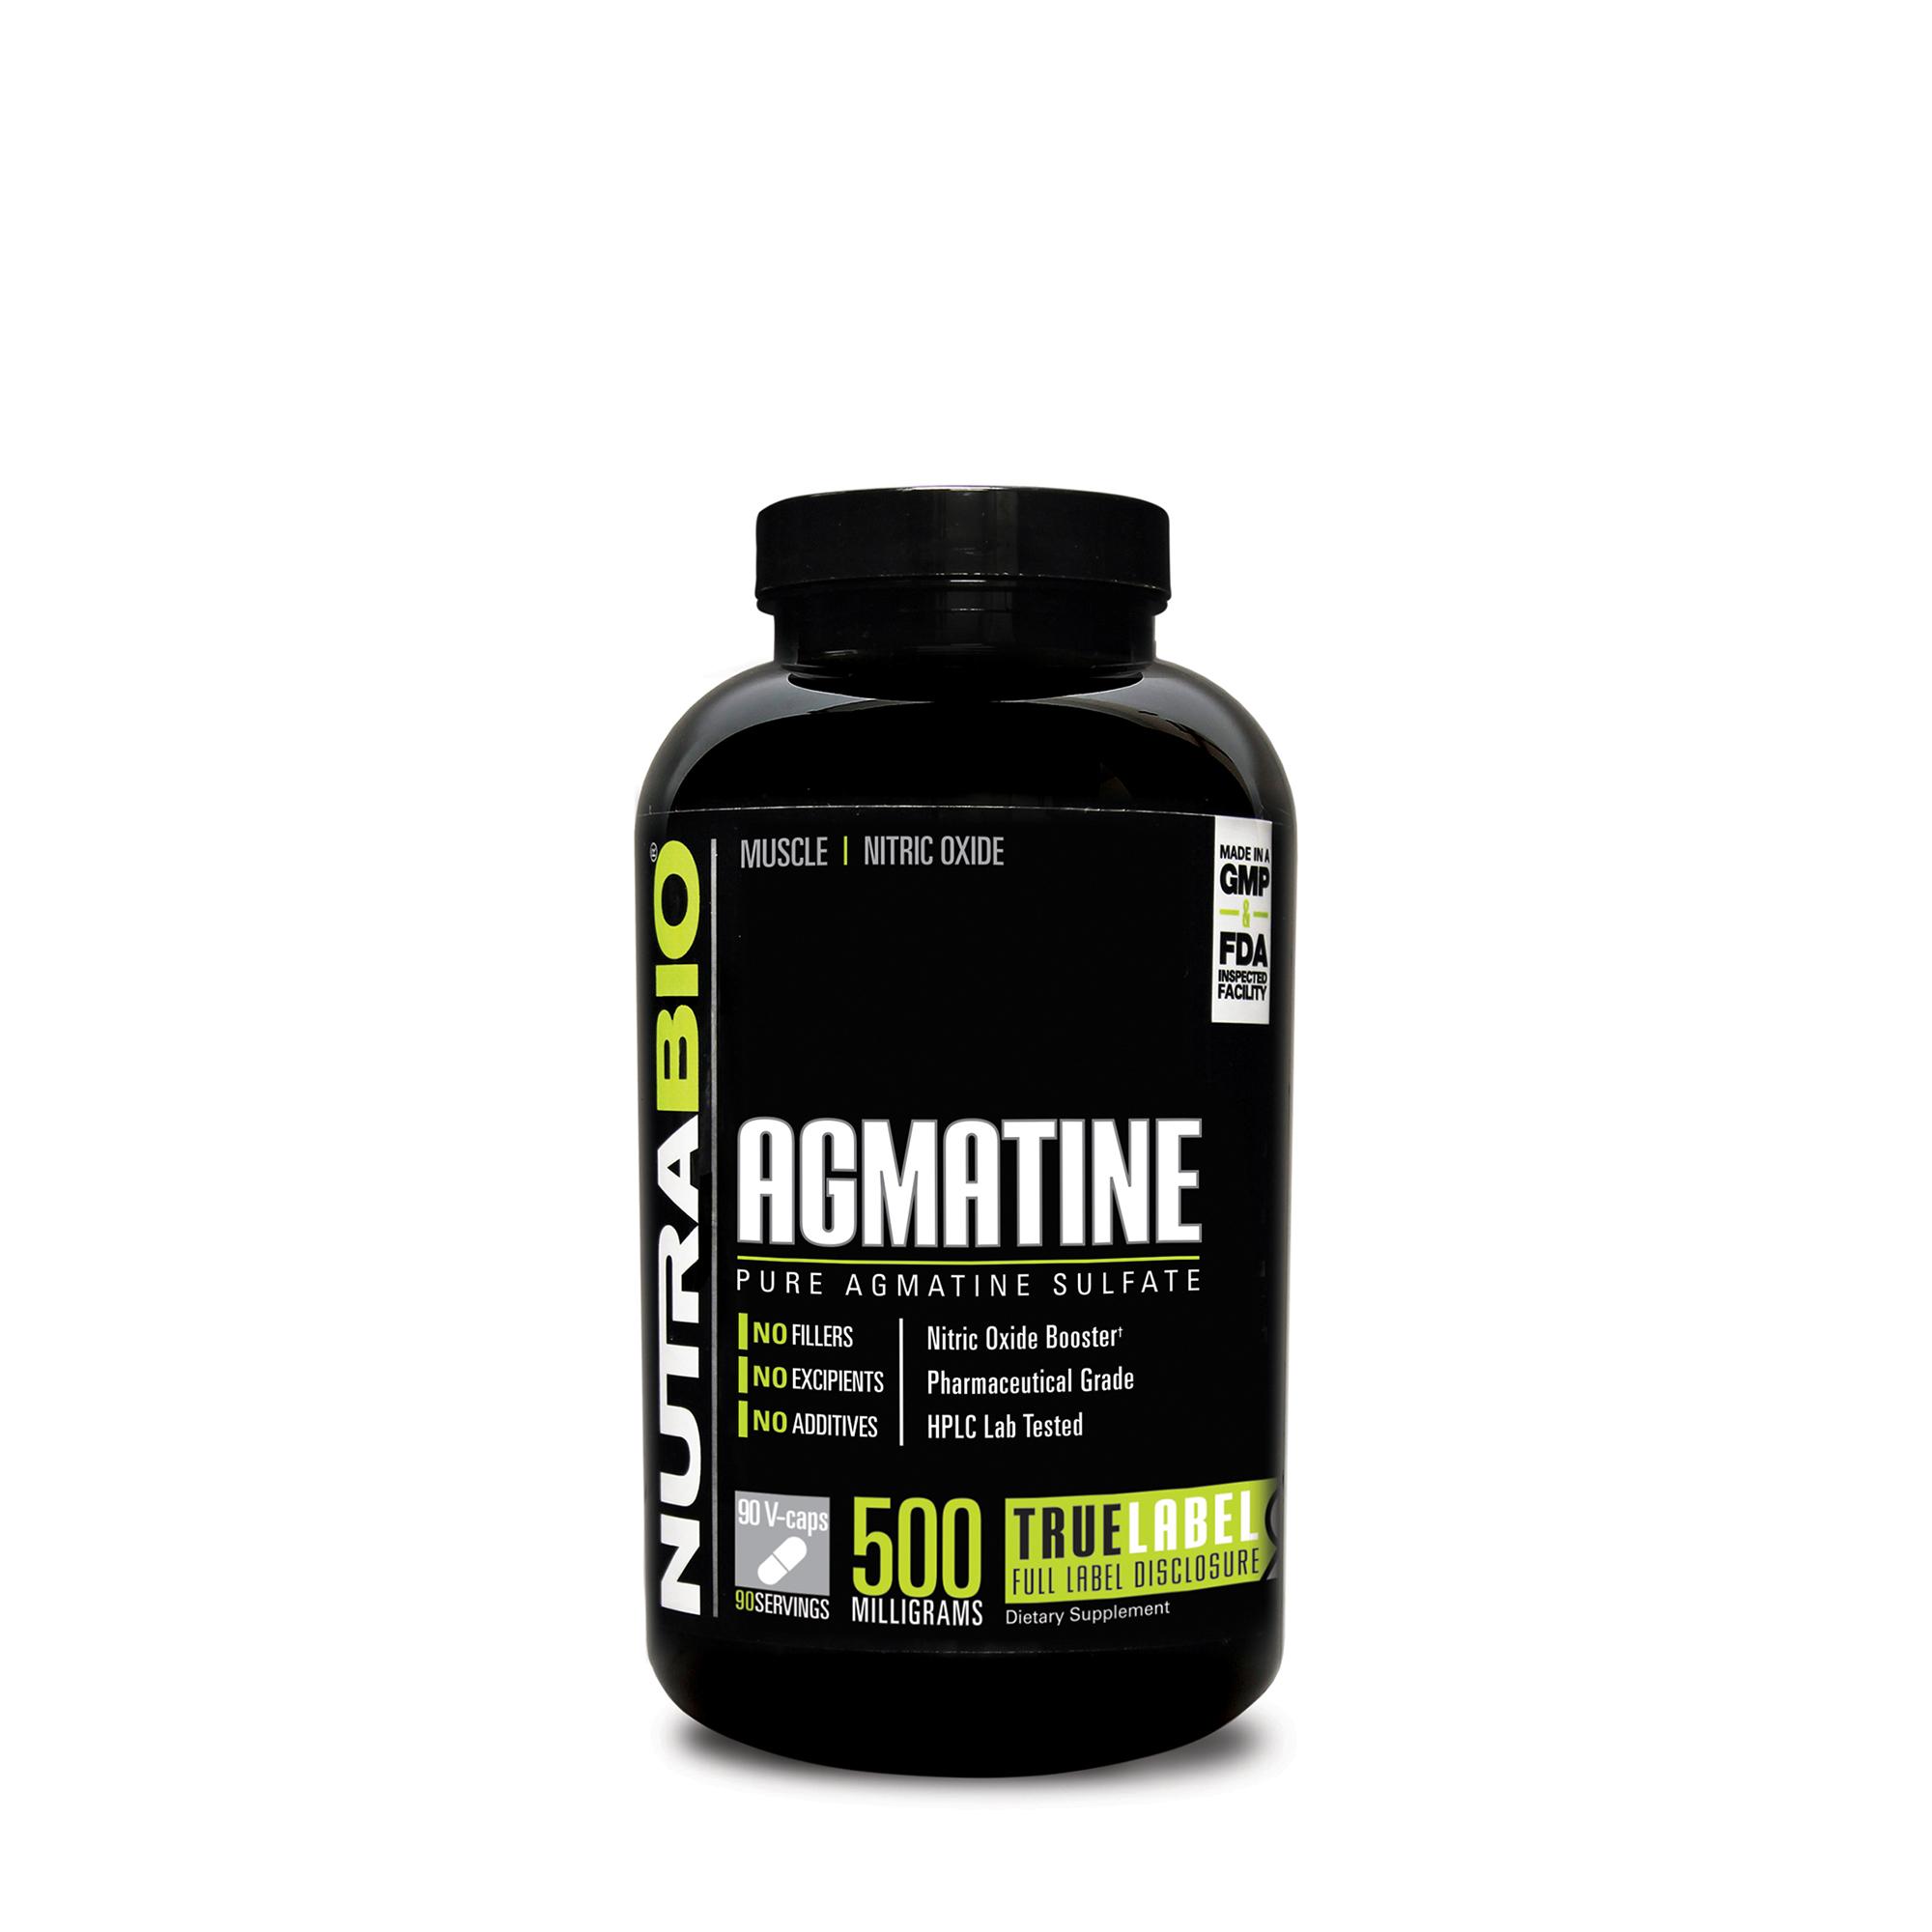 Agmatine Pure Agmatine Sulfate